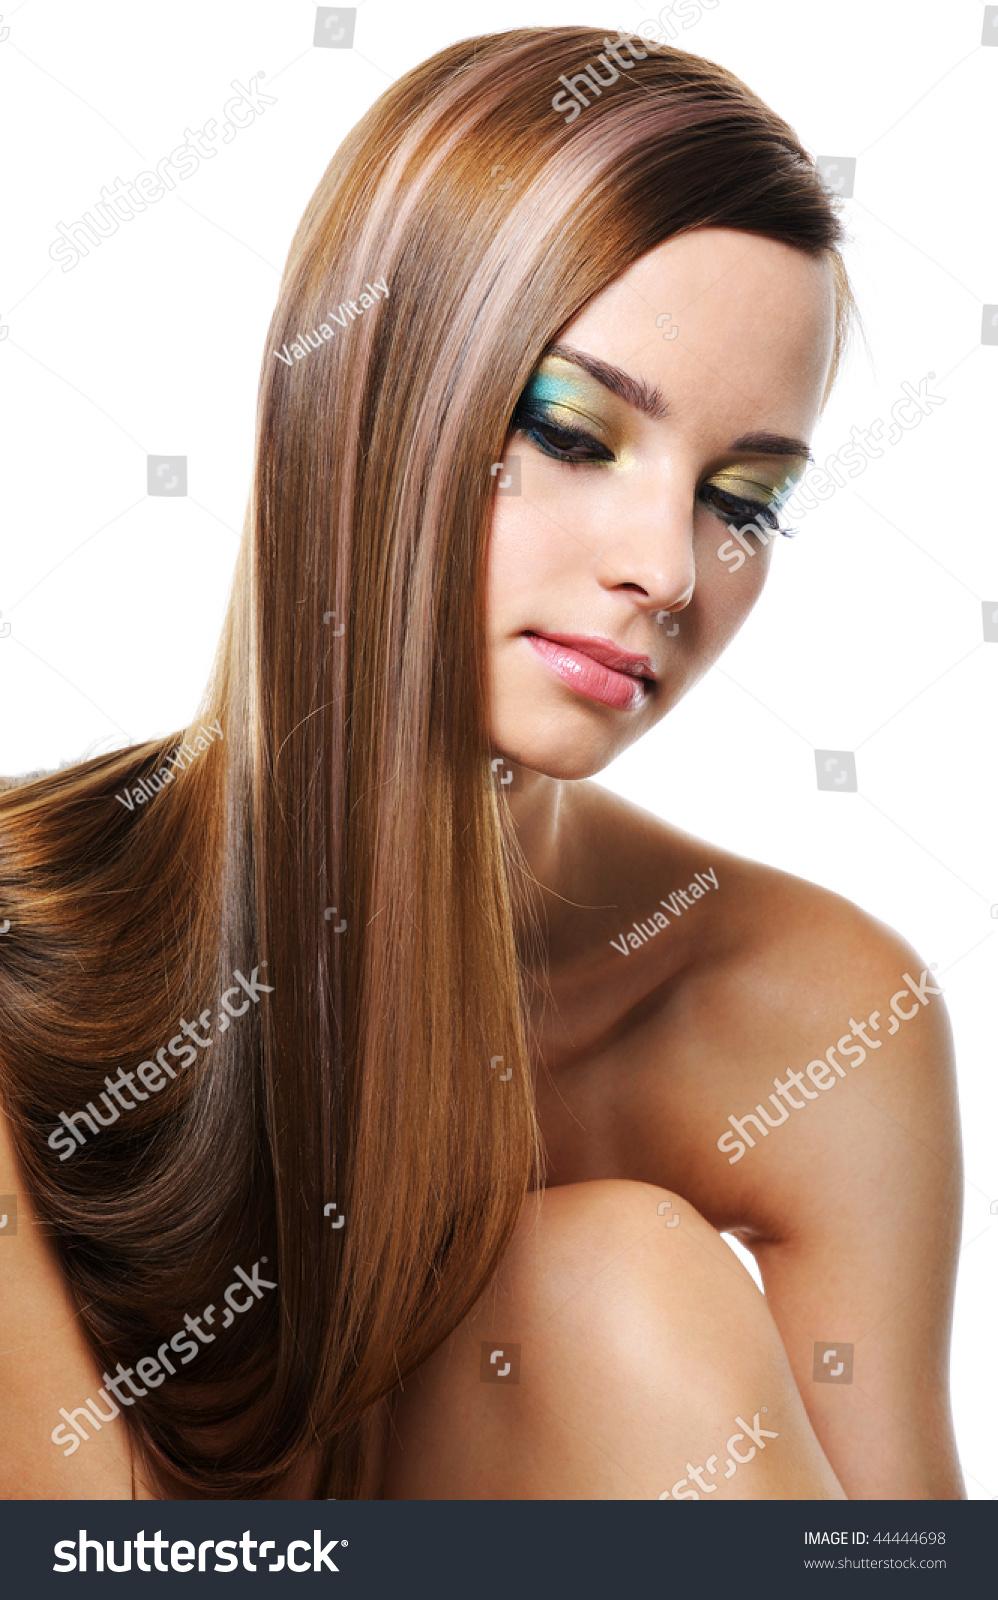 Portrait Beautiful Girl Smooth Gloss Long Stock Photo 44444698 - Shutterstock